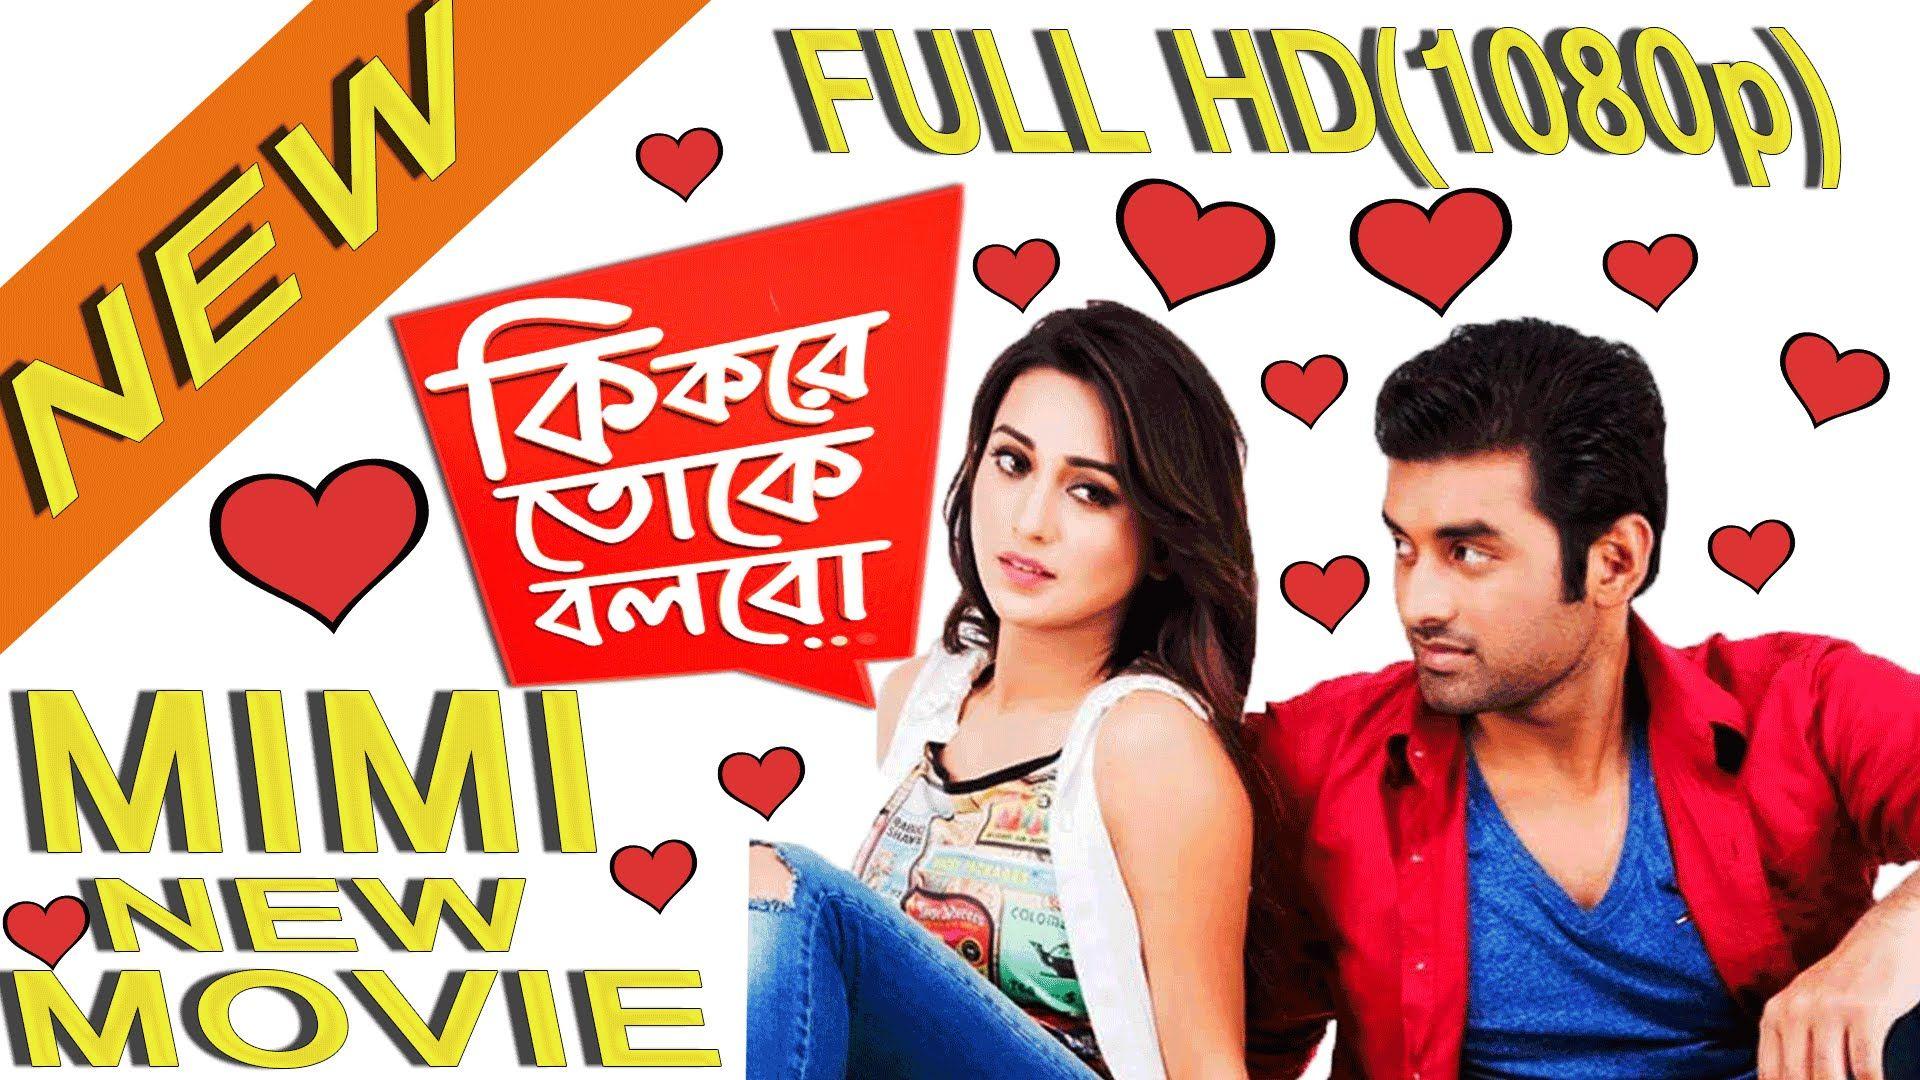 ki kore toke bolbo full movie torrent download bengali